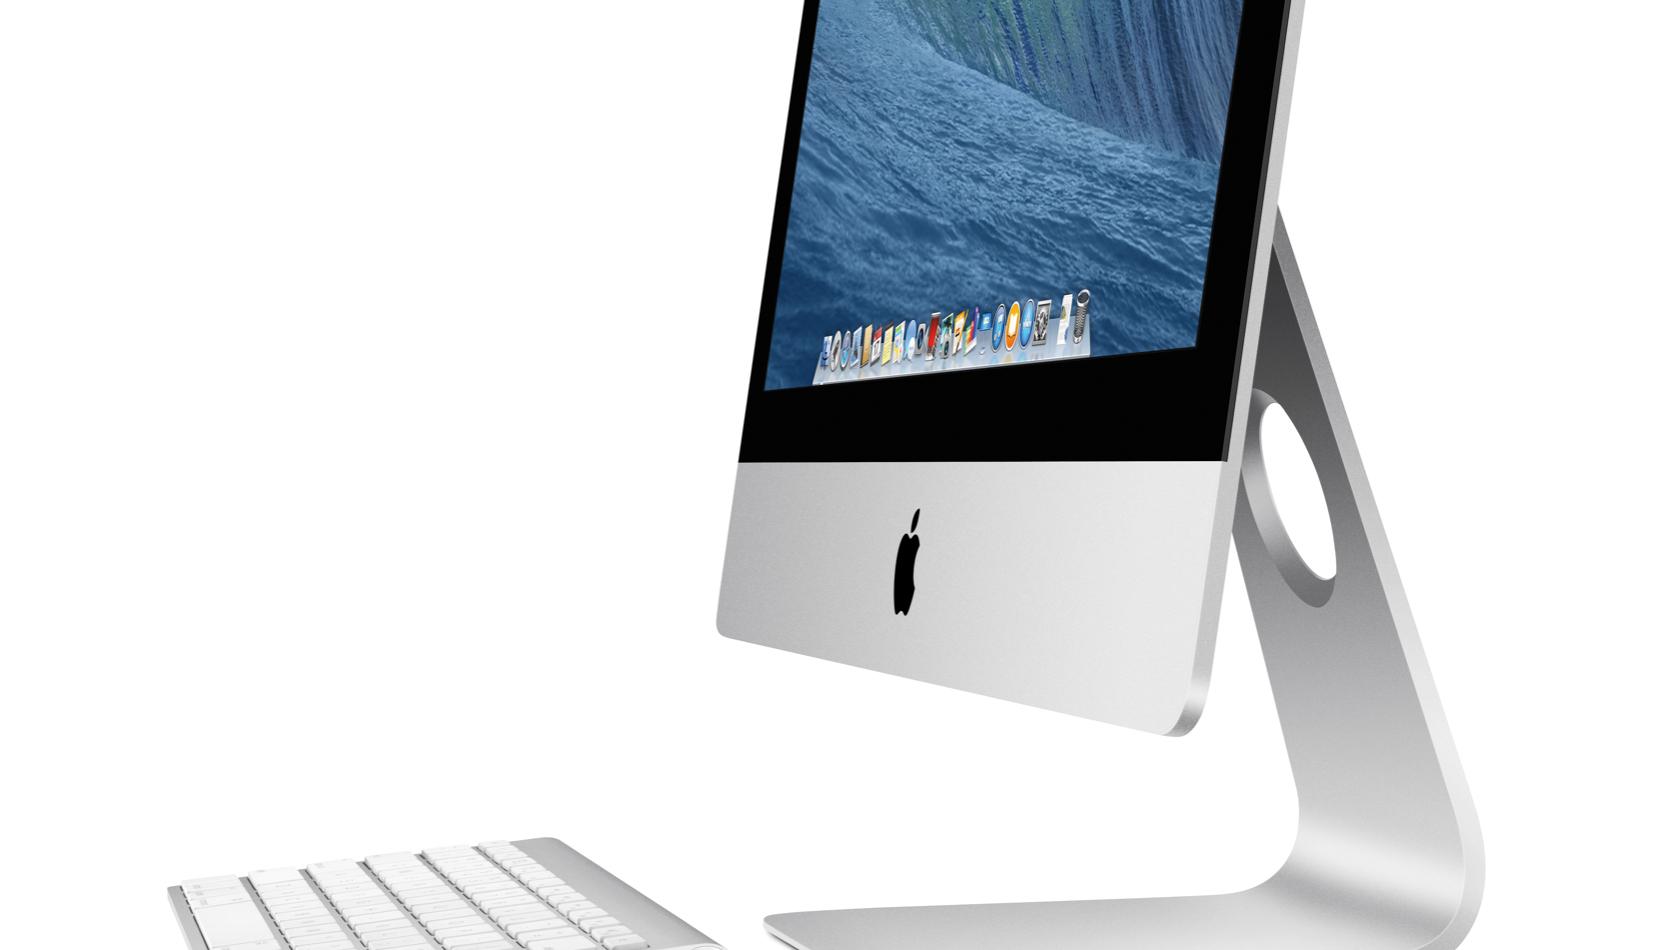 Apple Launches Cheaper $1,099 iMac